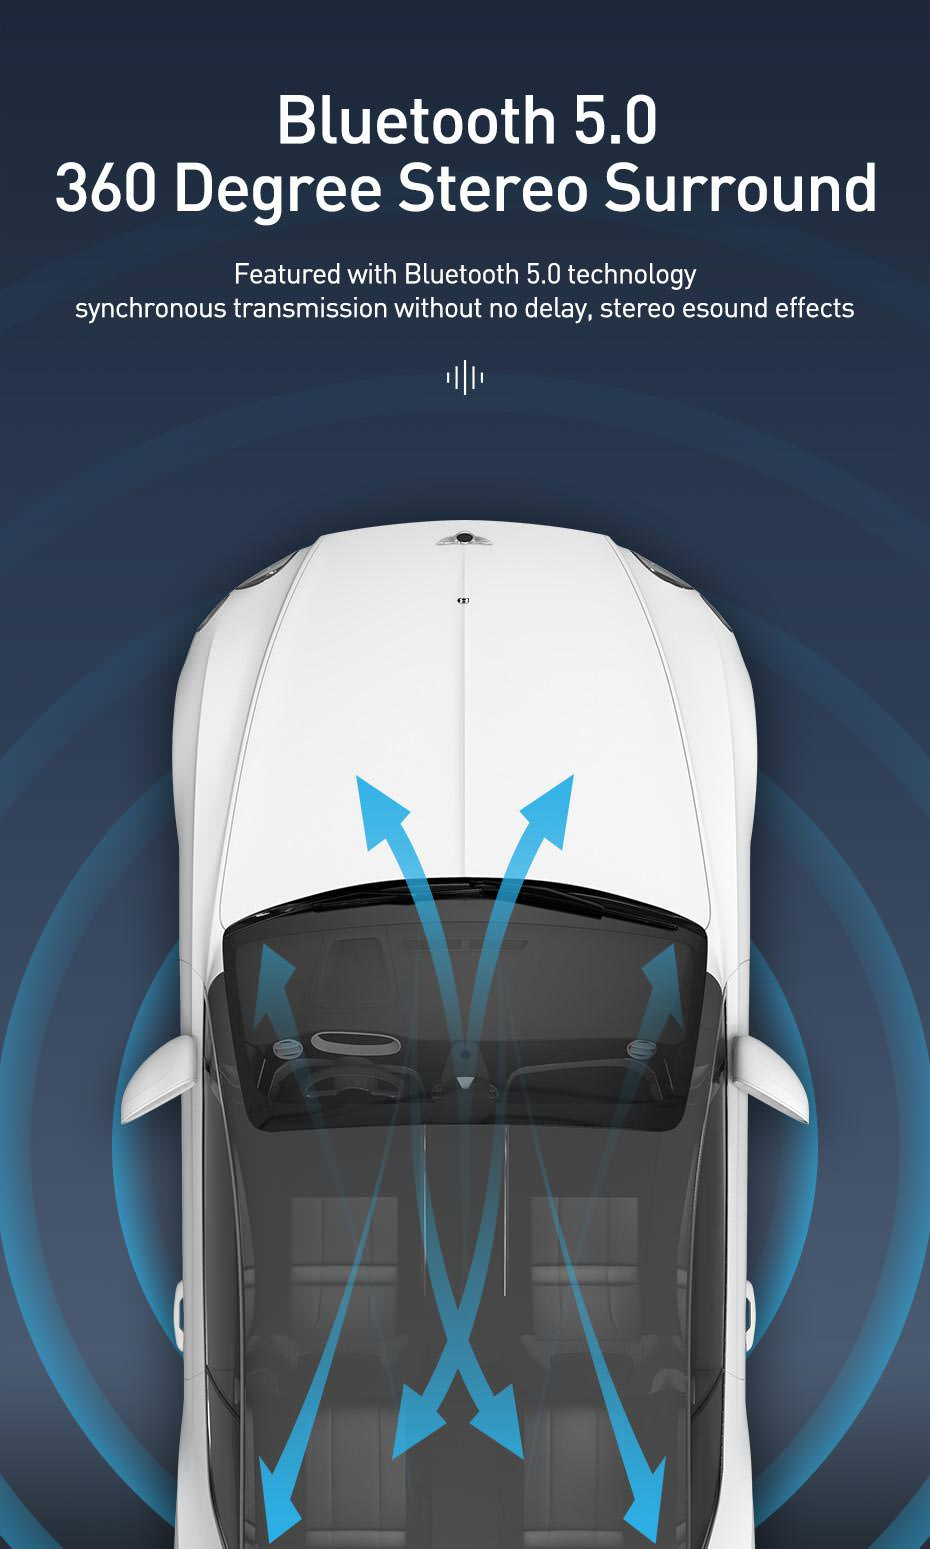 baseus bluetooth car charger 2019